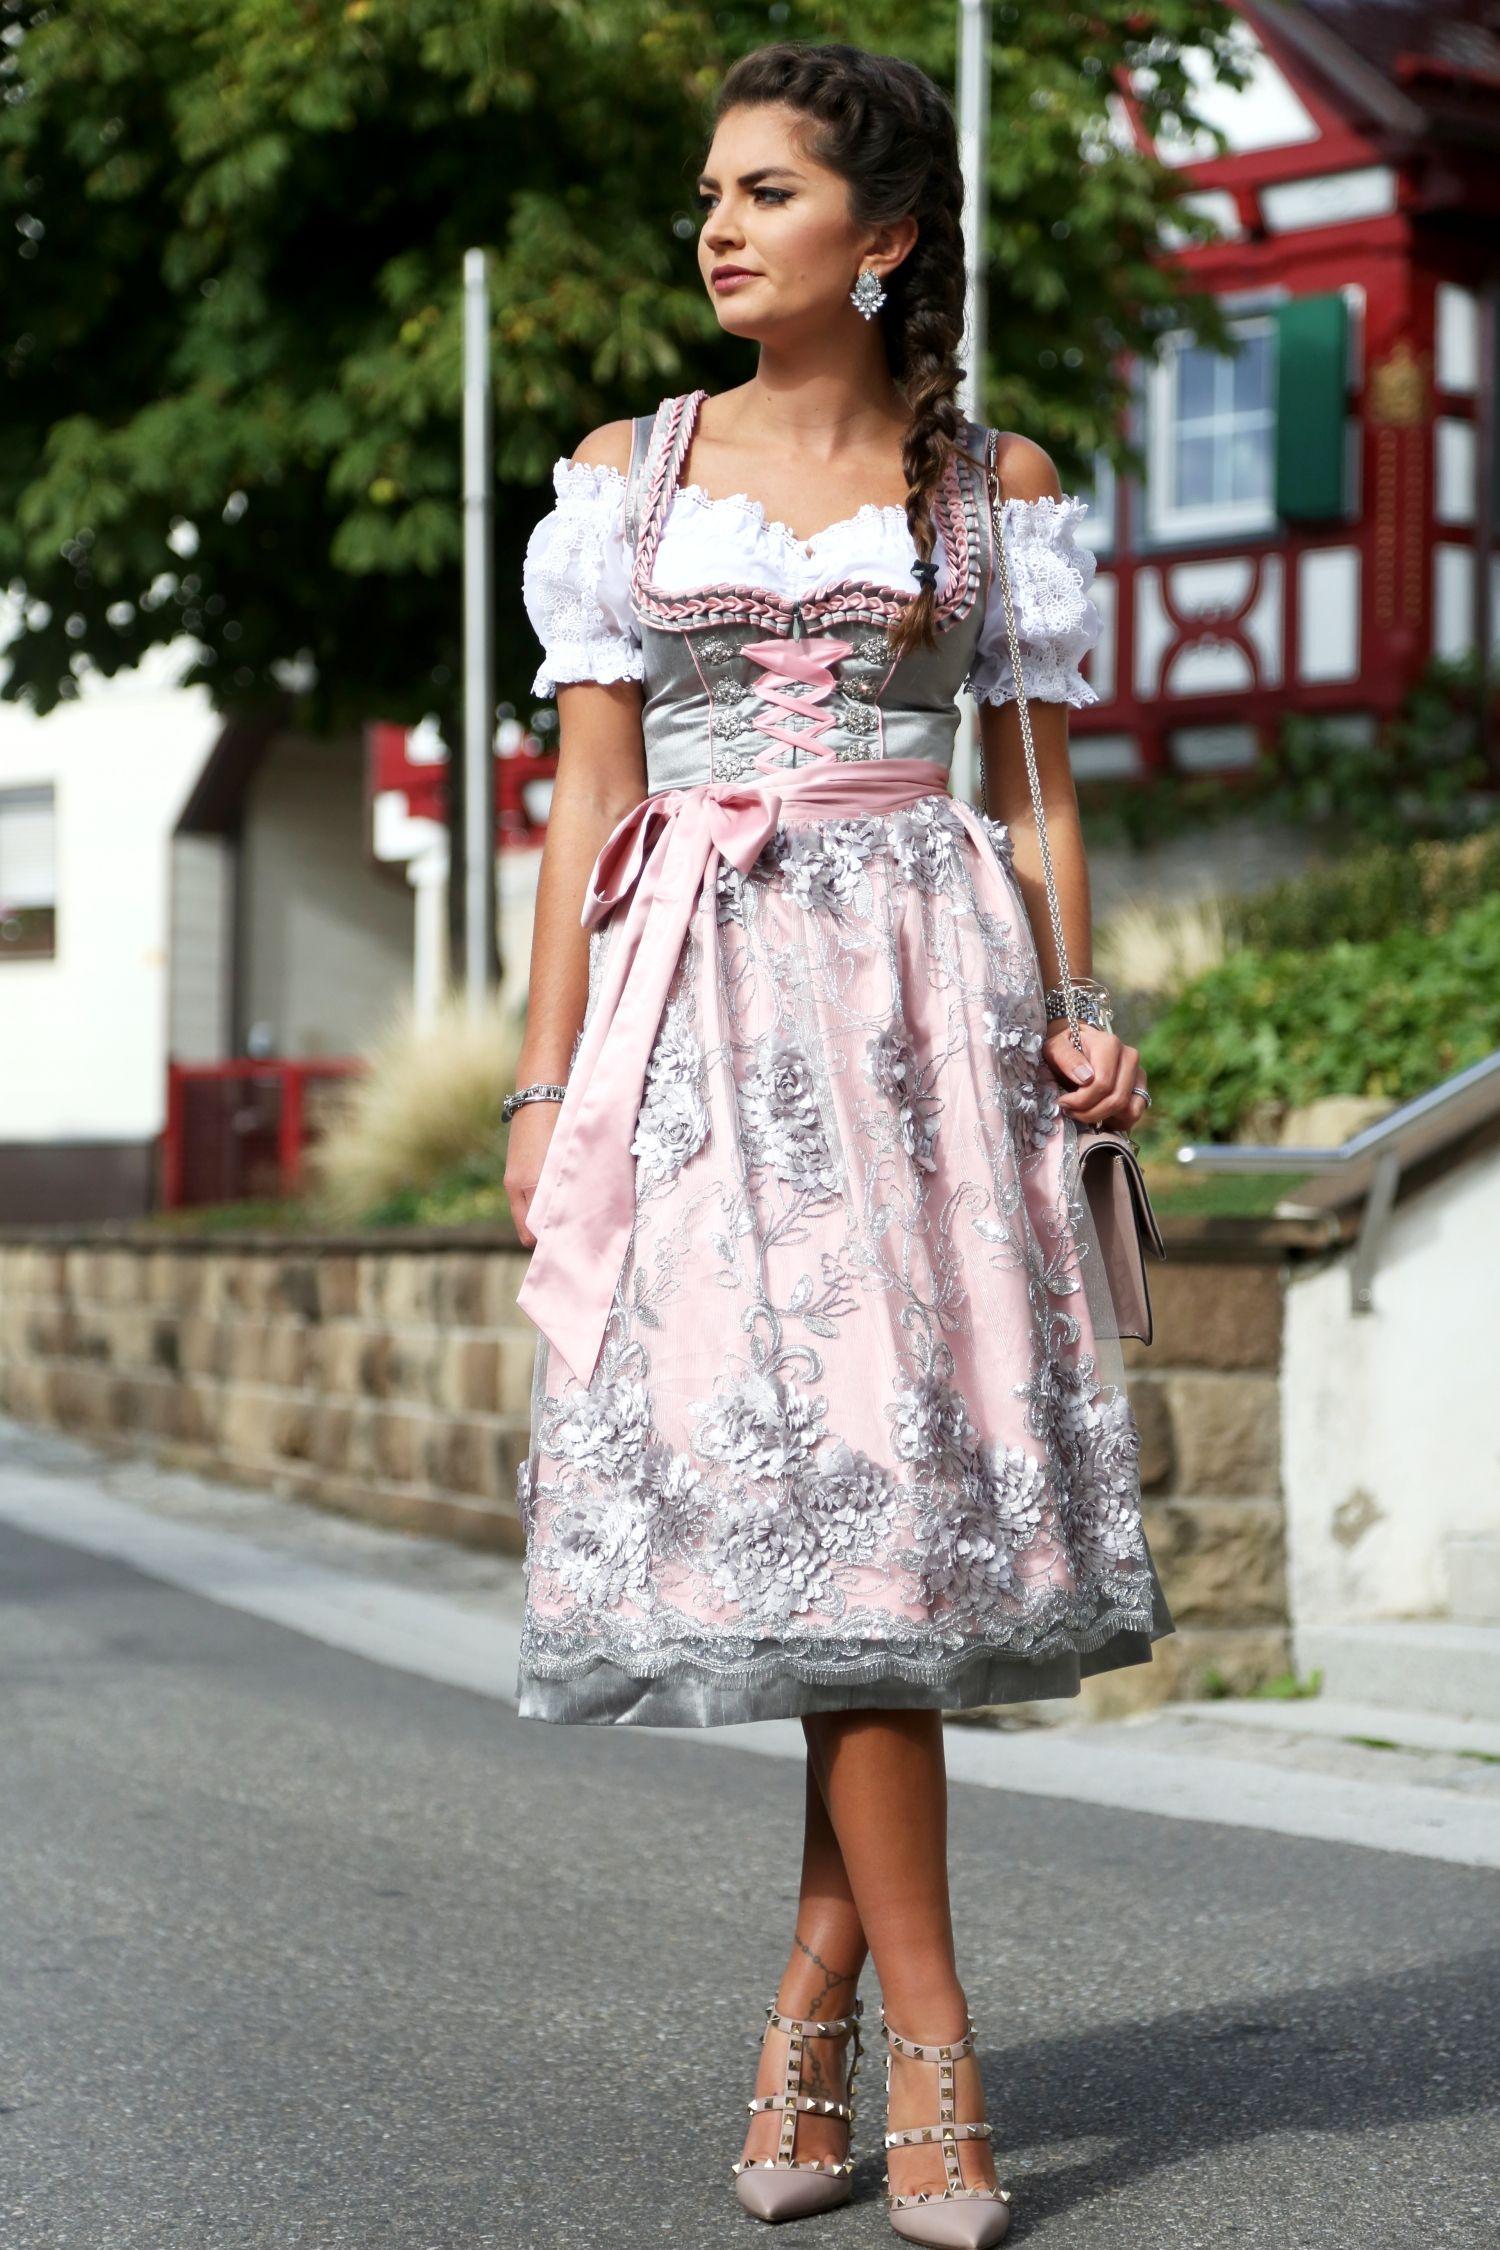 the perfect Dirndl for Oktoberfest/Wasen | dindrli ...